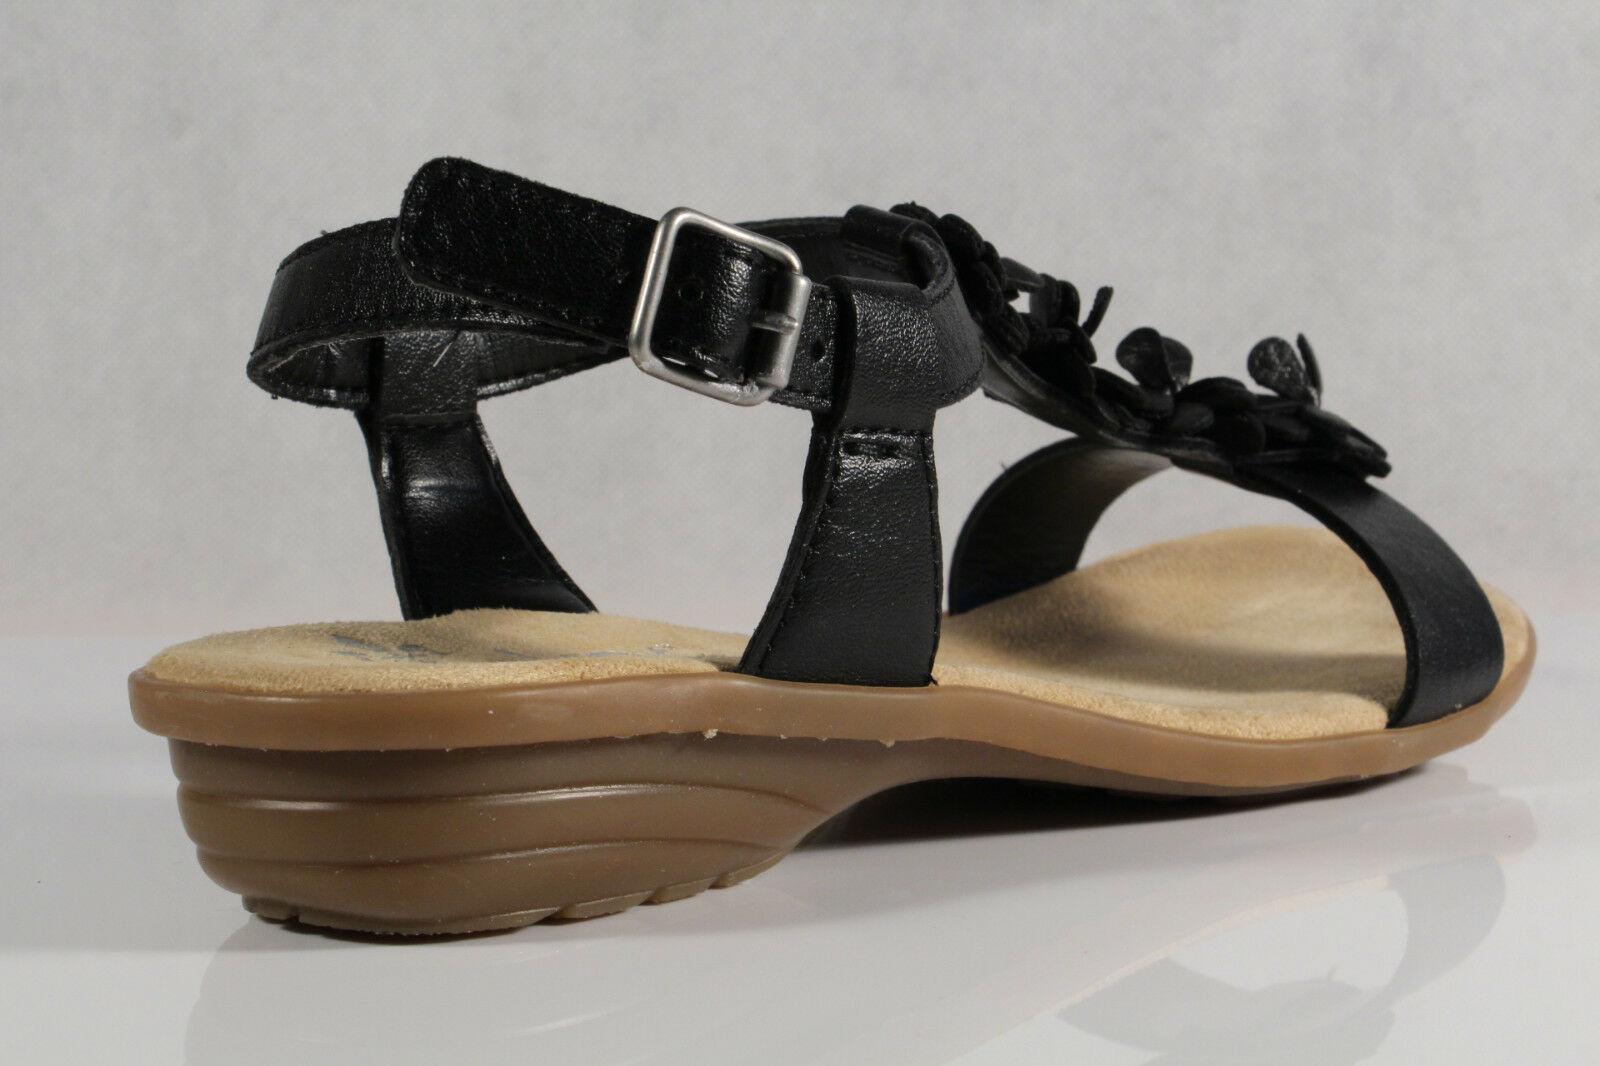 Rieker Damen Sandale Sandalette Sandalen schwarz V3446 NEU NEU NEU   43d2ee